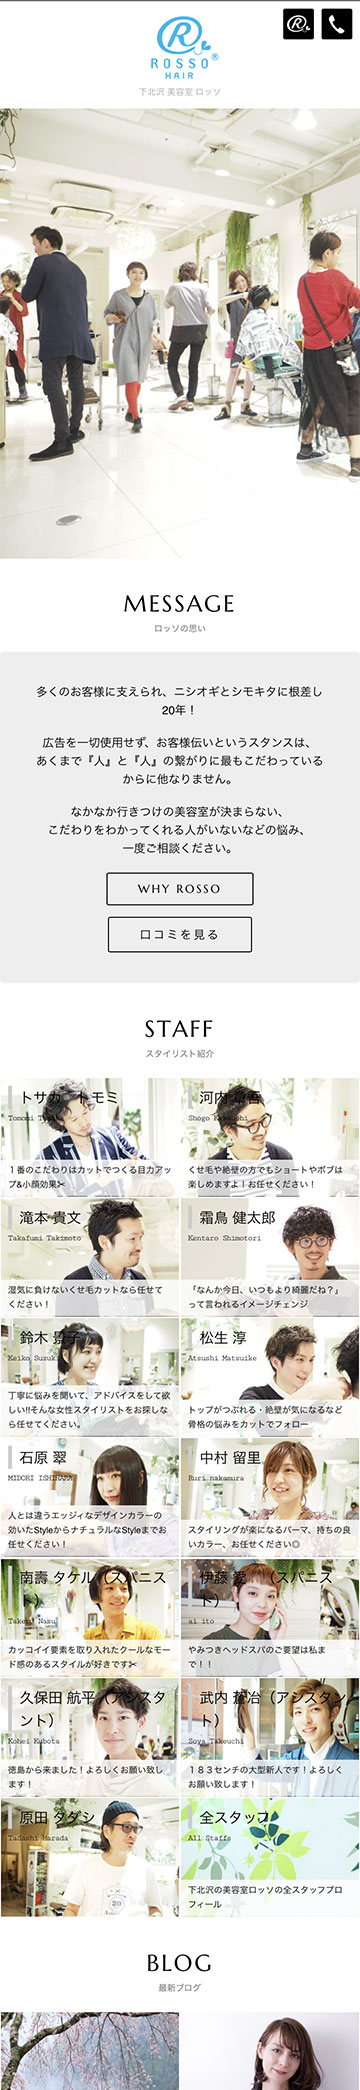 ROSSO HAIR スマホサイト 1